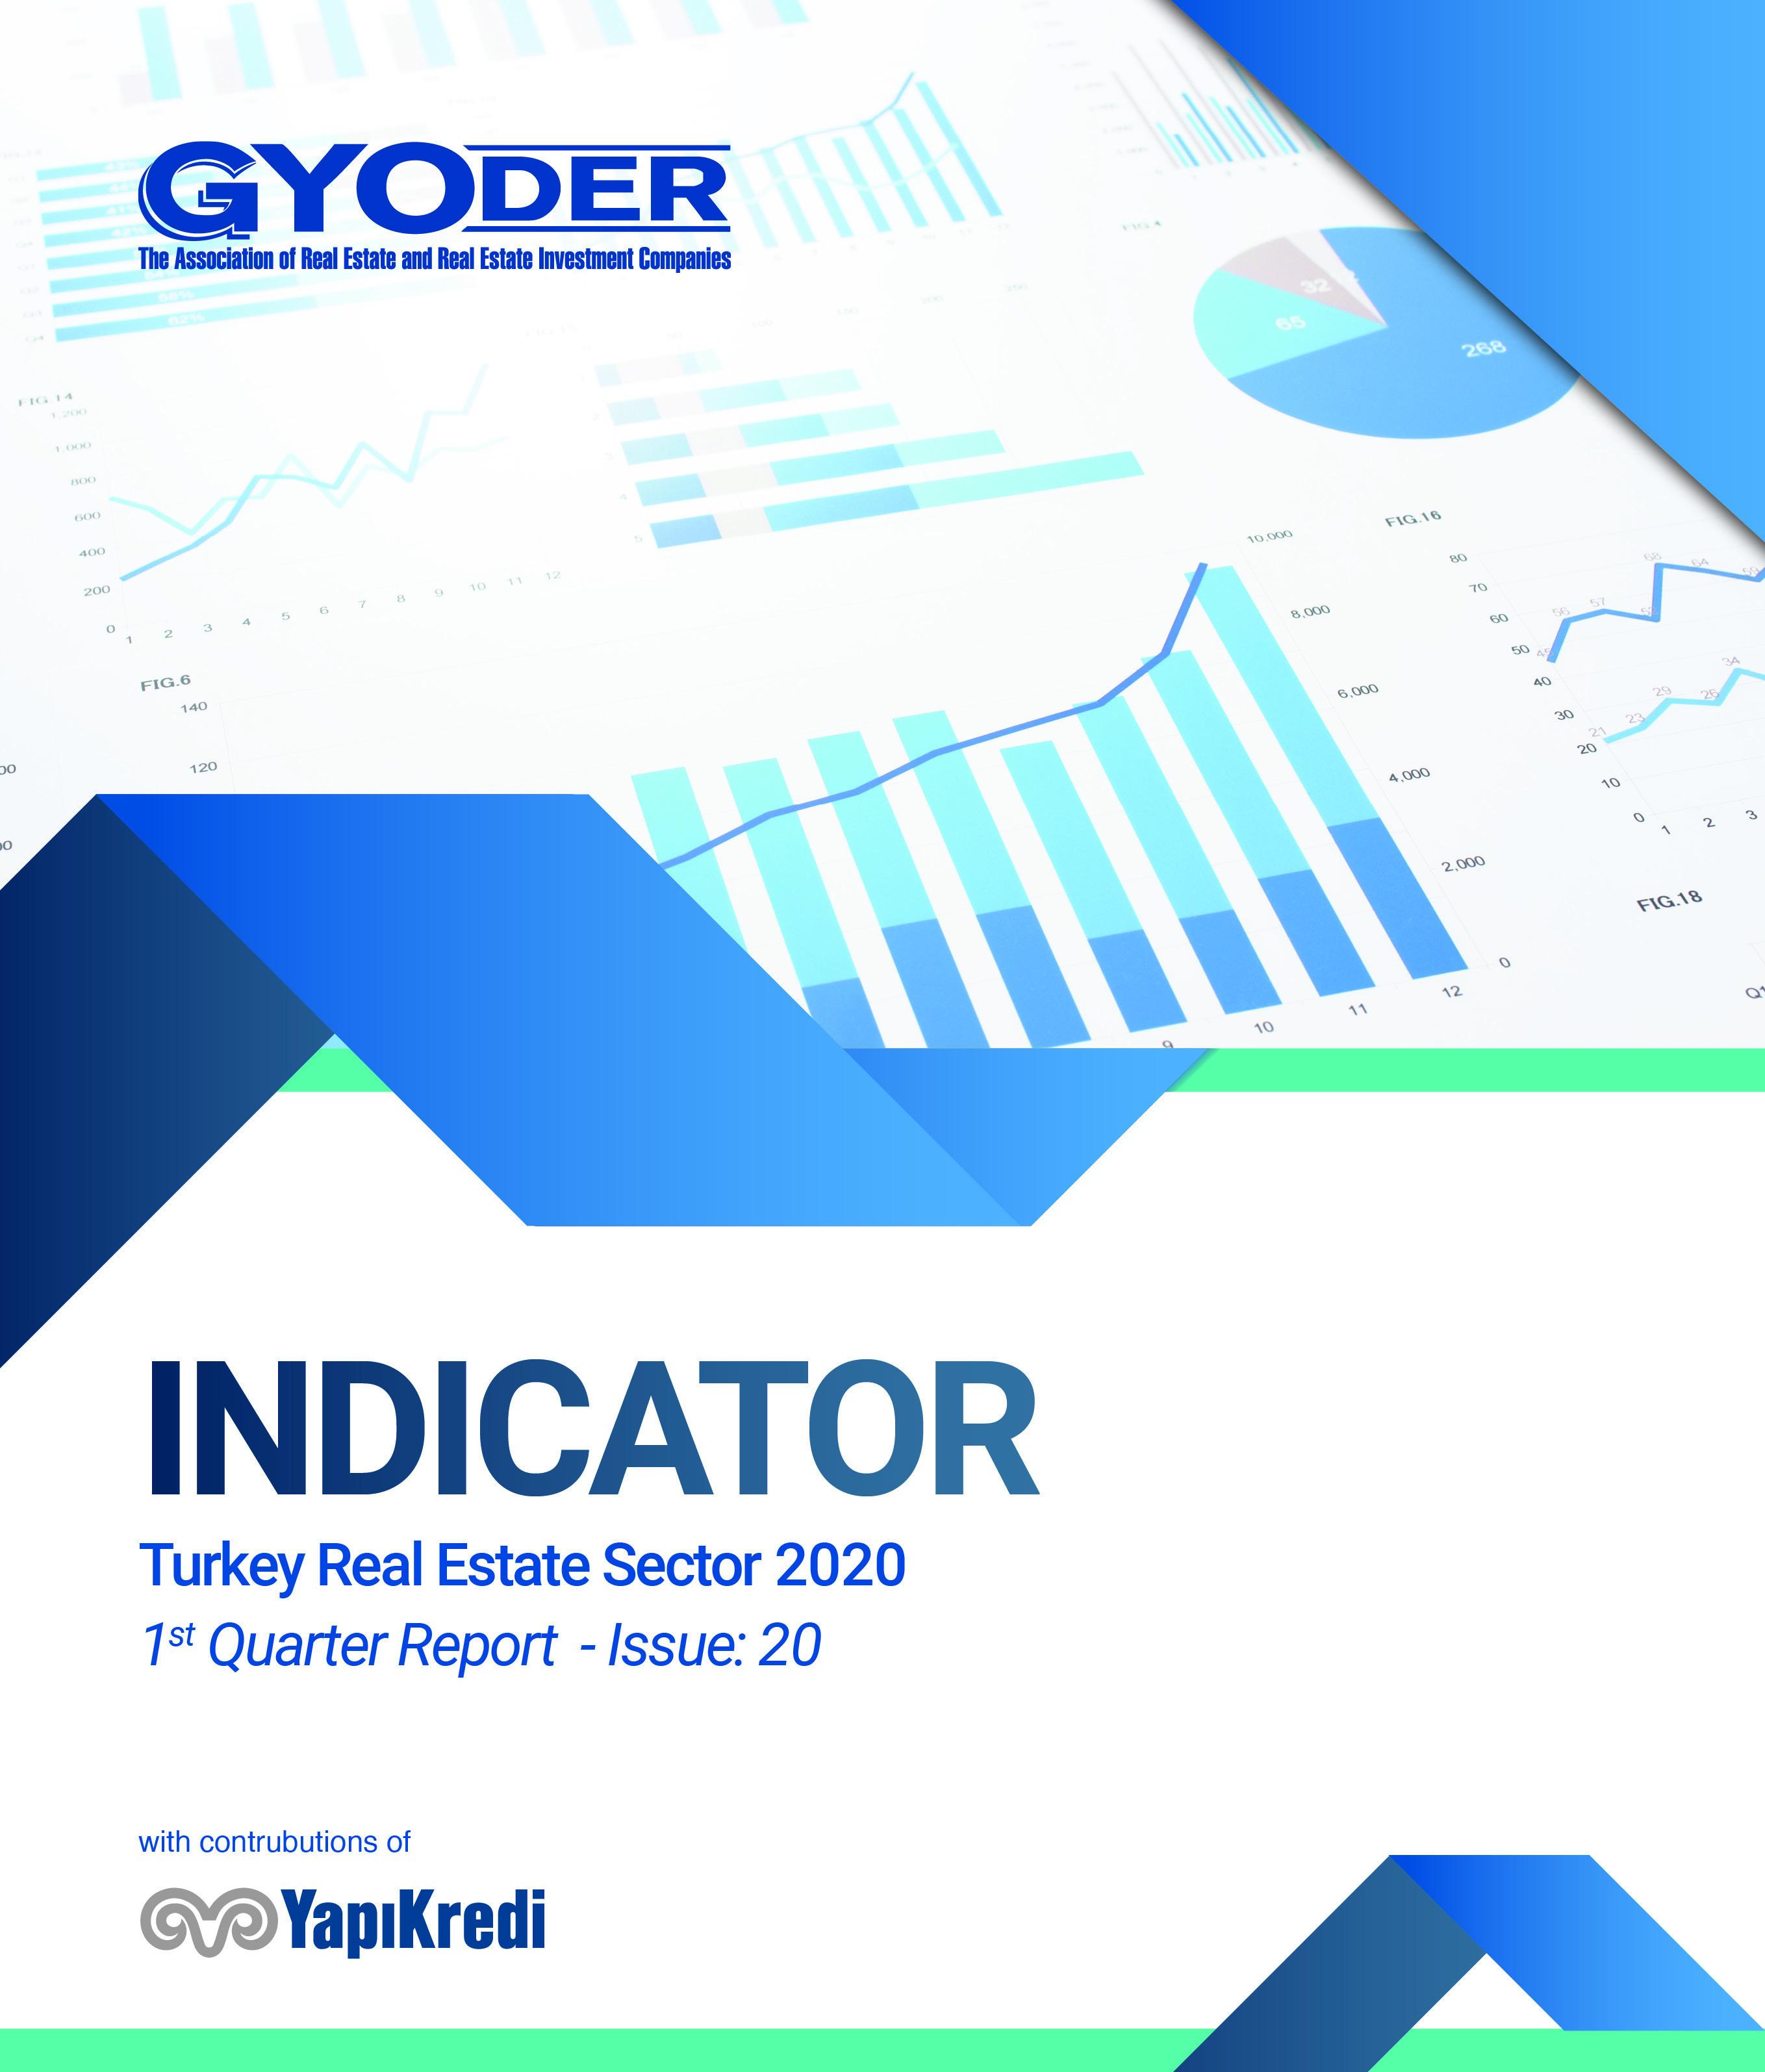 GYODER Indicator, Turkish Real Estate Sector 2020 1st Quarter Report